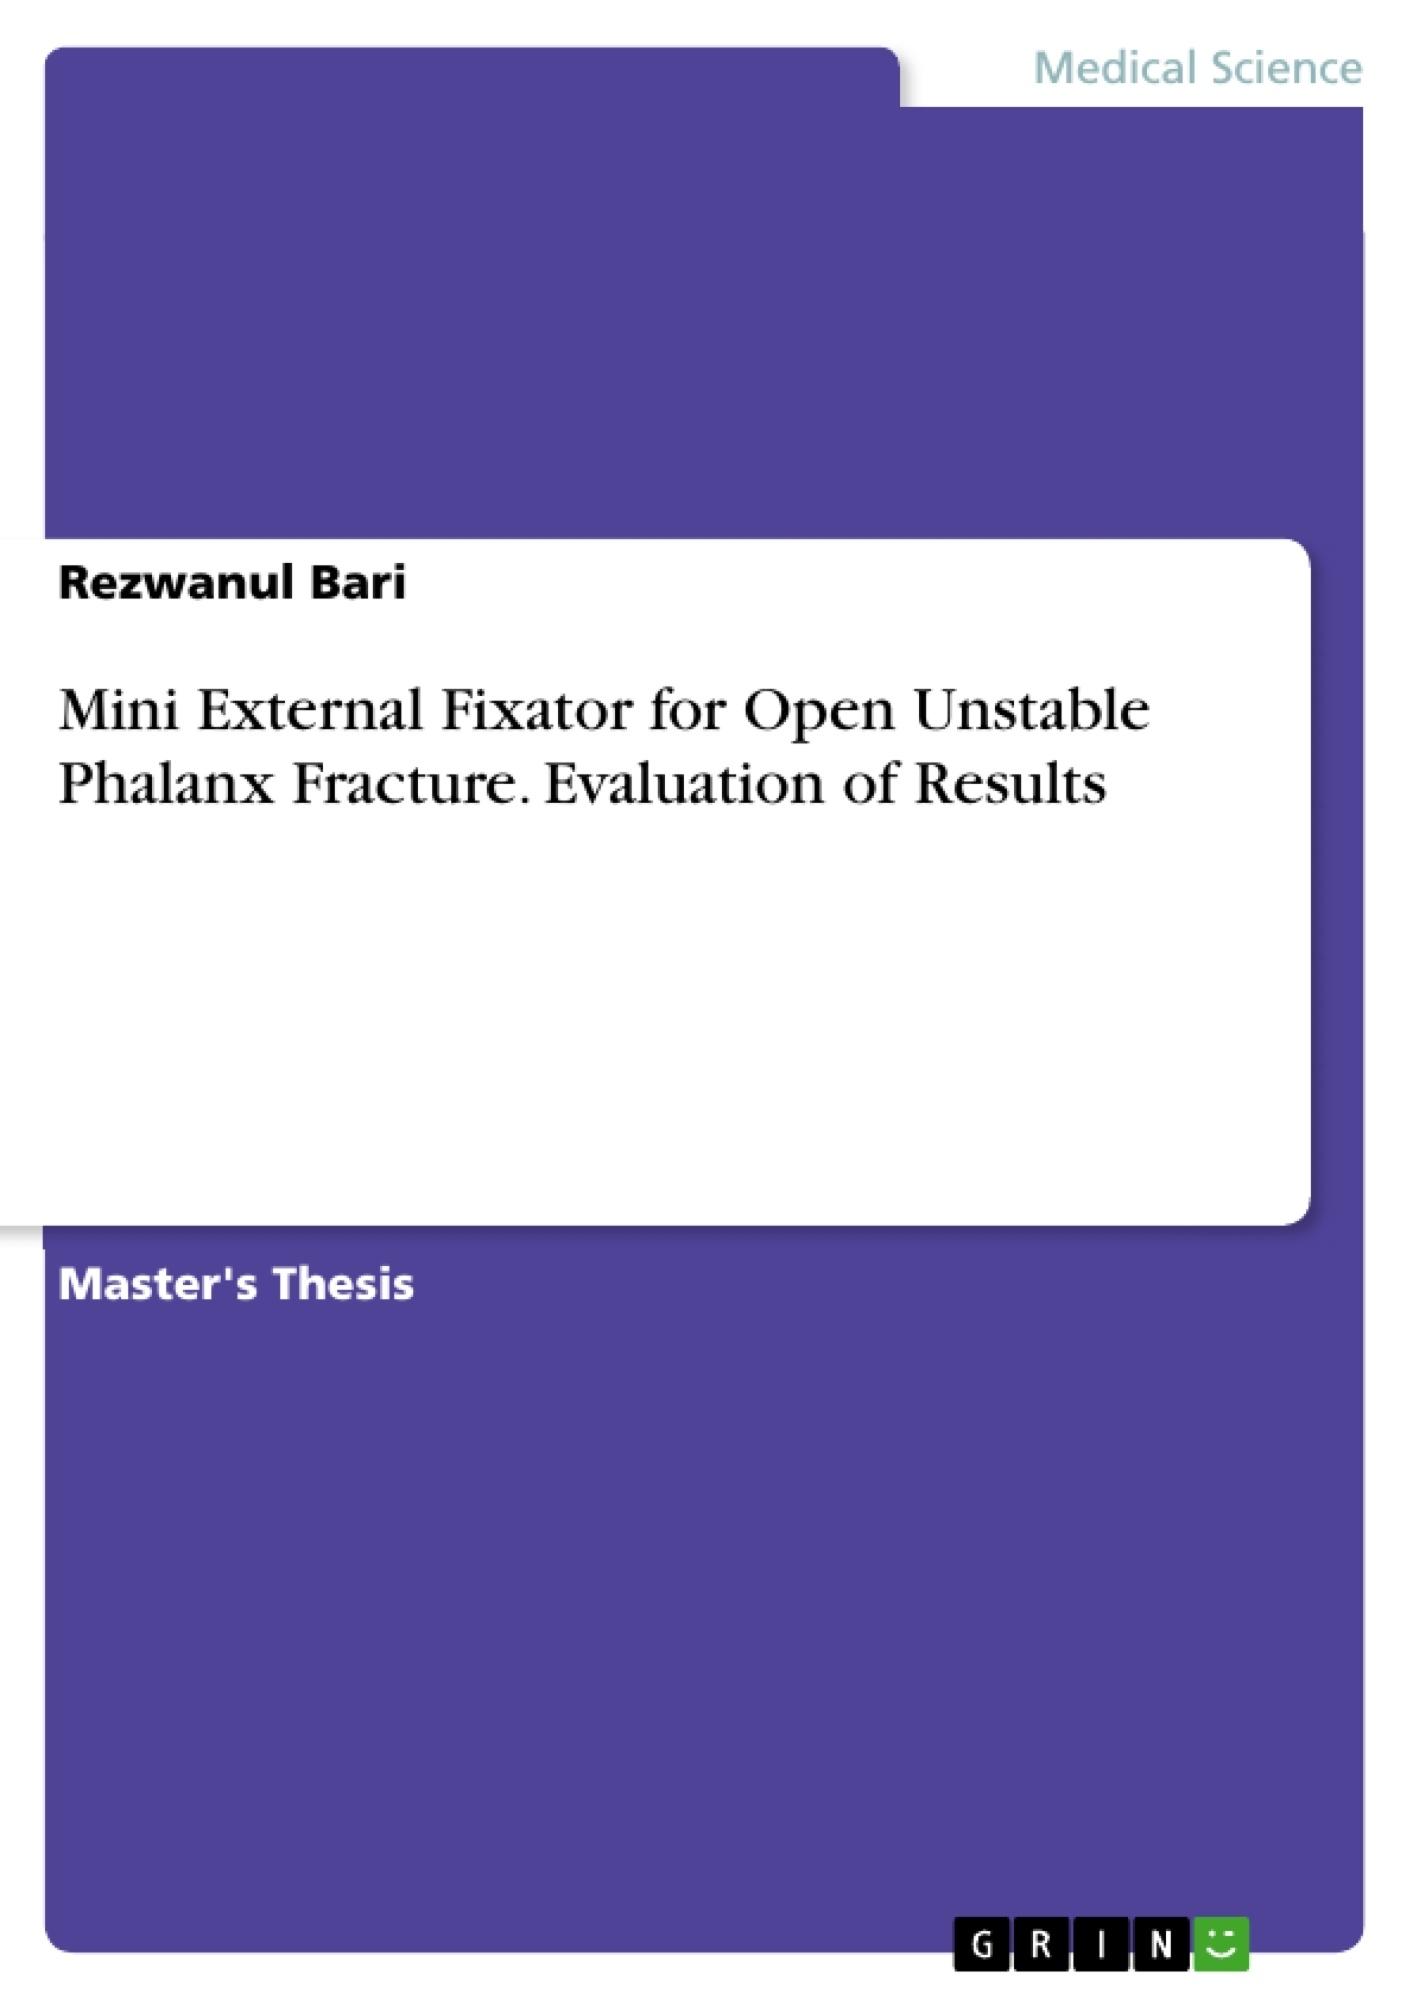 Mini External Fixator For Open Unstable Phalanx Fracture